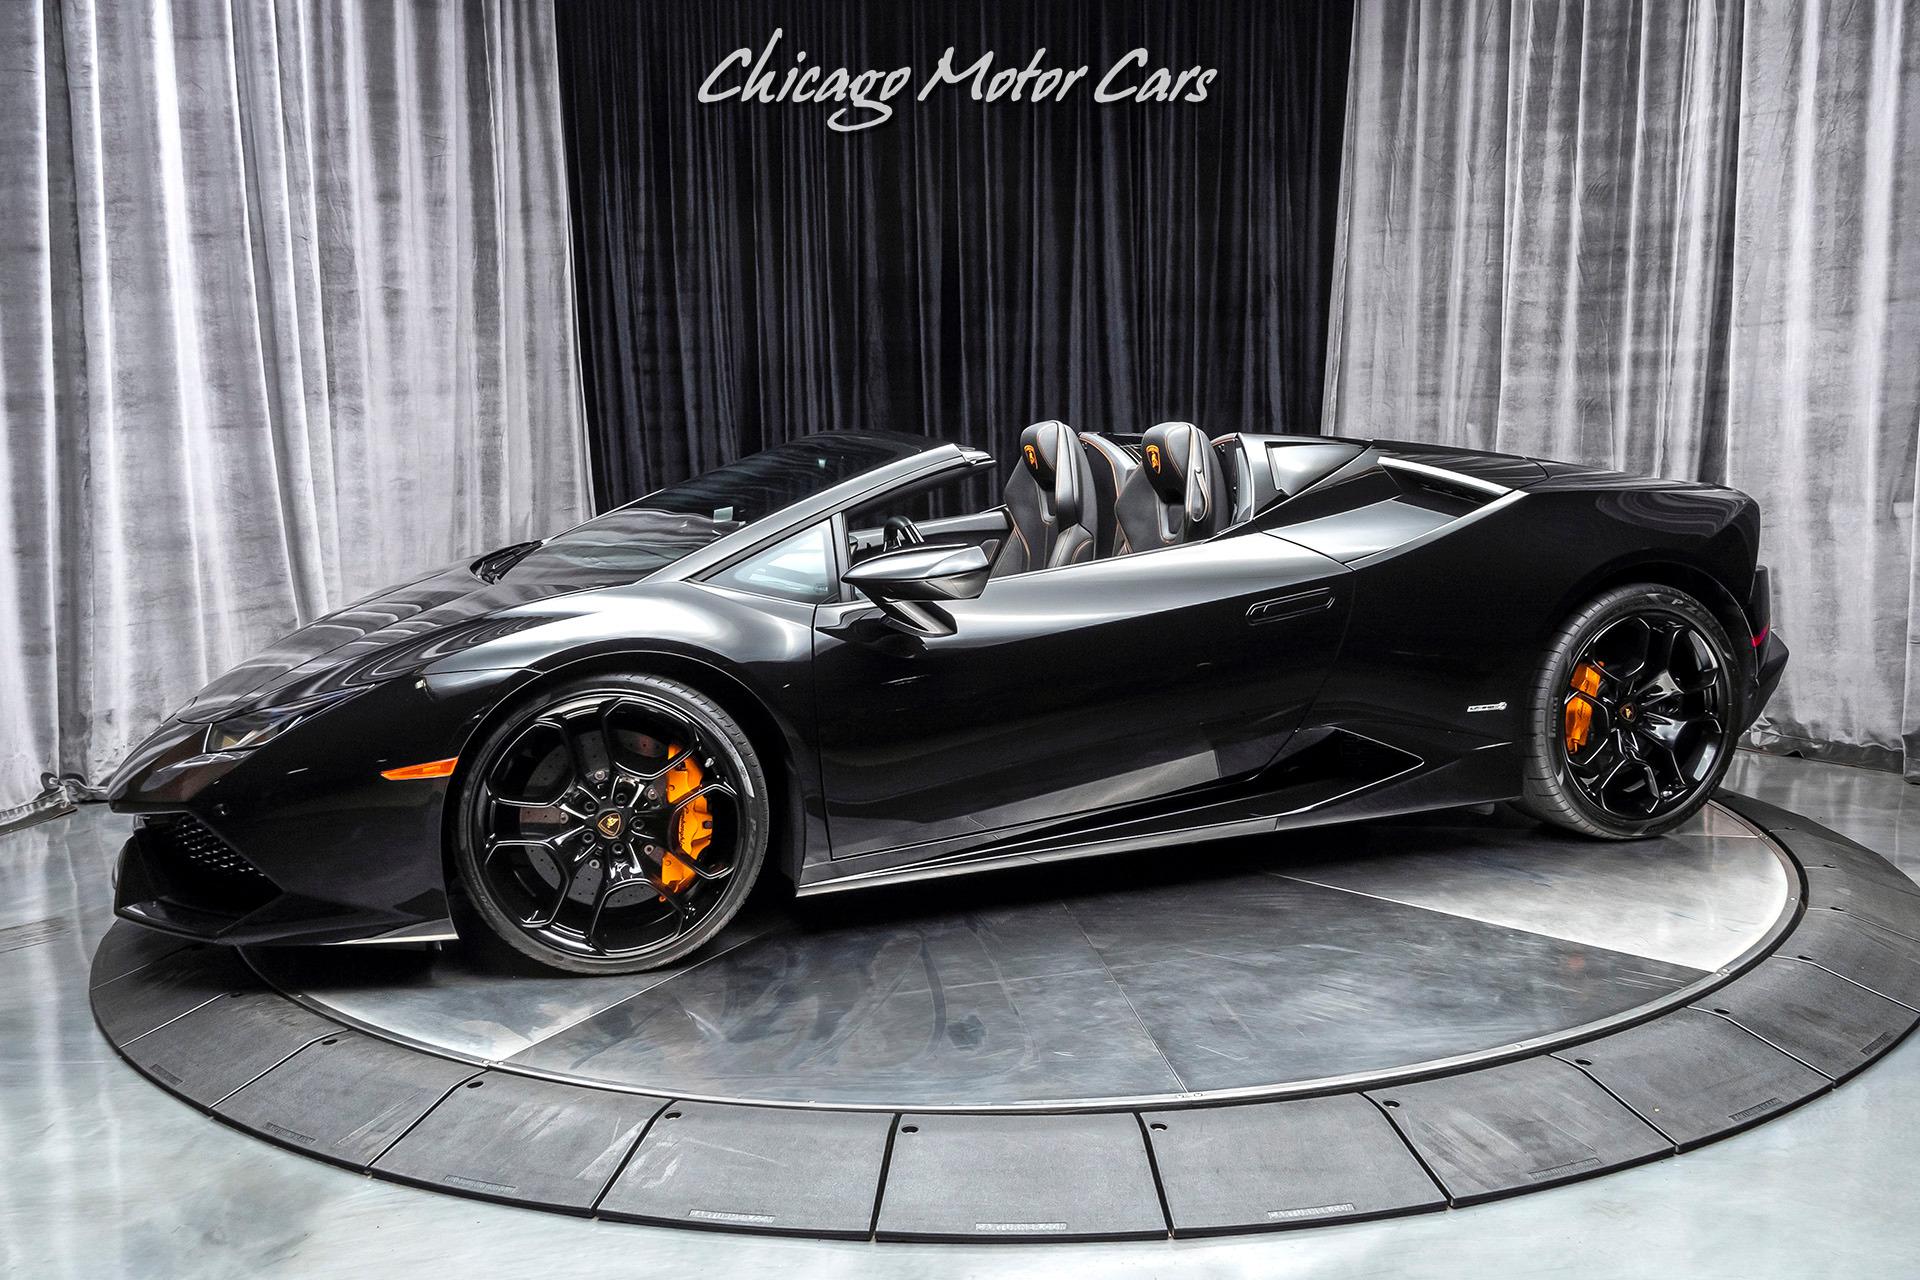 Used-2017-Lamborghini-Huracan-LP-610-4-Spyder-297kMSRP-Ad-Personam-Interior